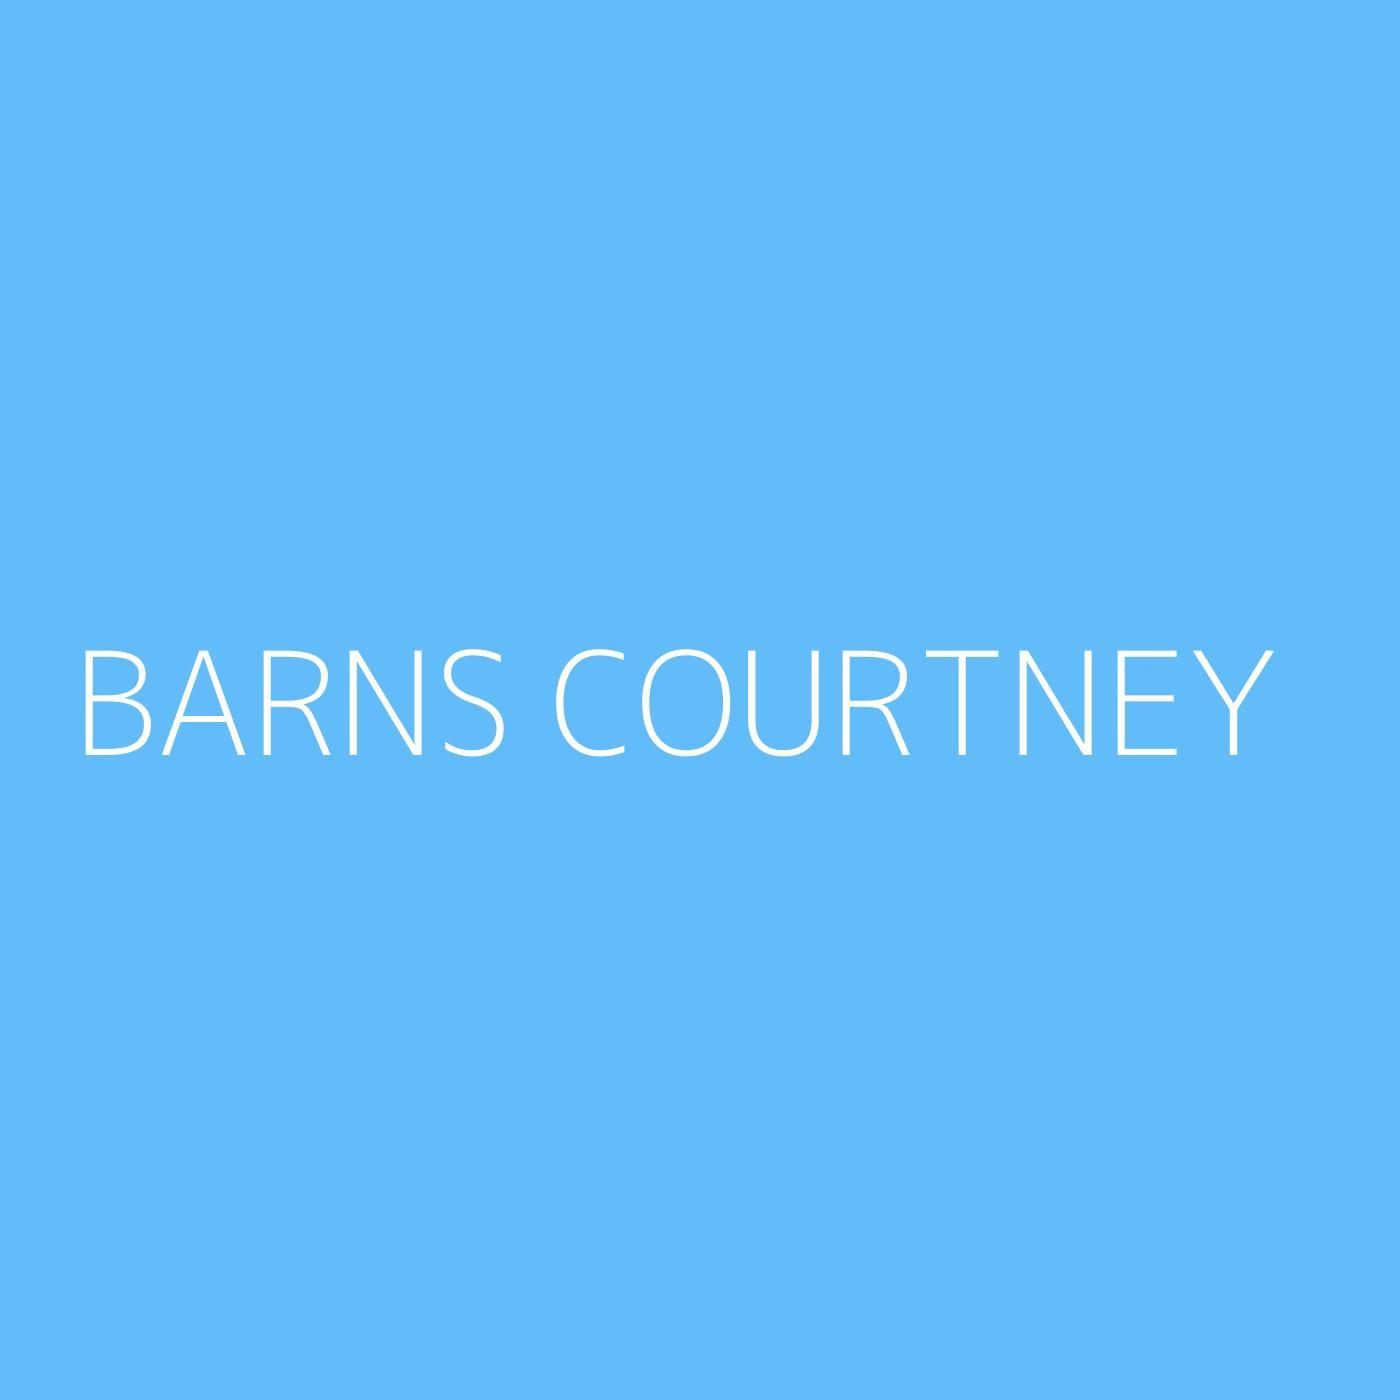 Barns Courtney Playlist Artwork